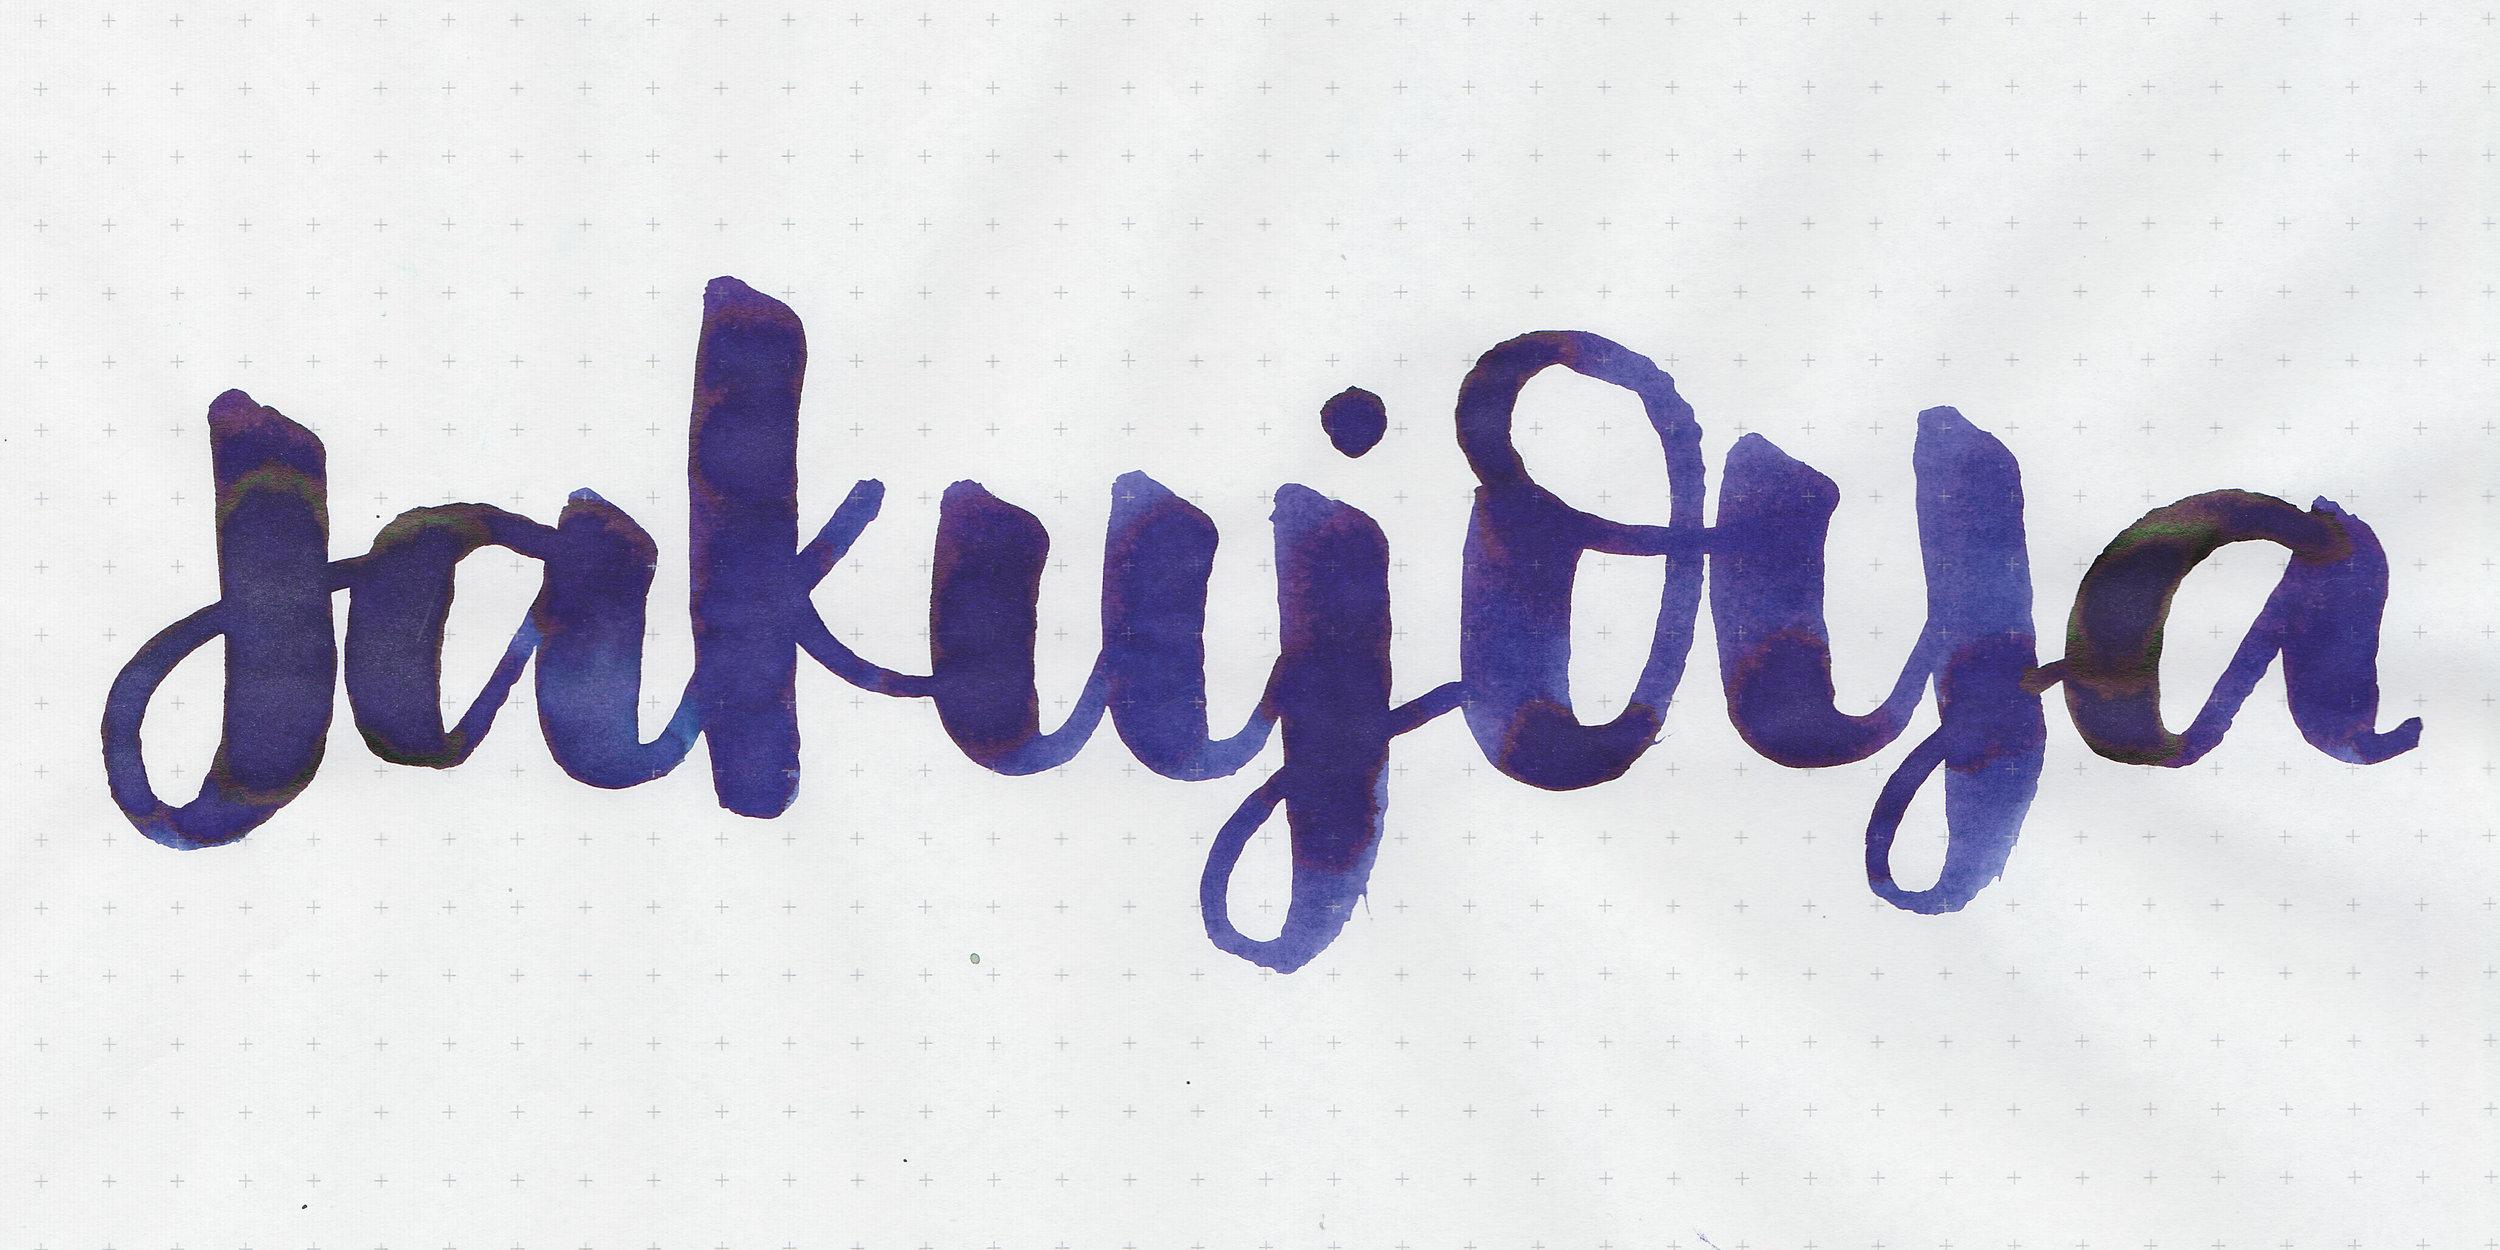 ps-jakujoya-2.jpg